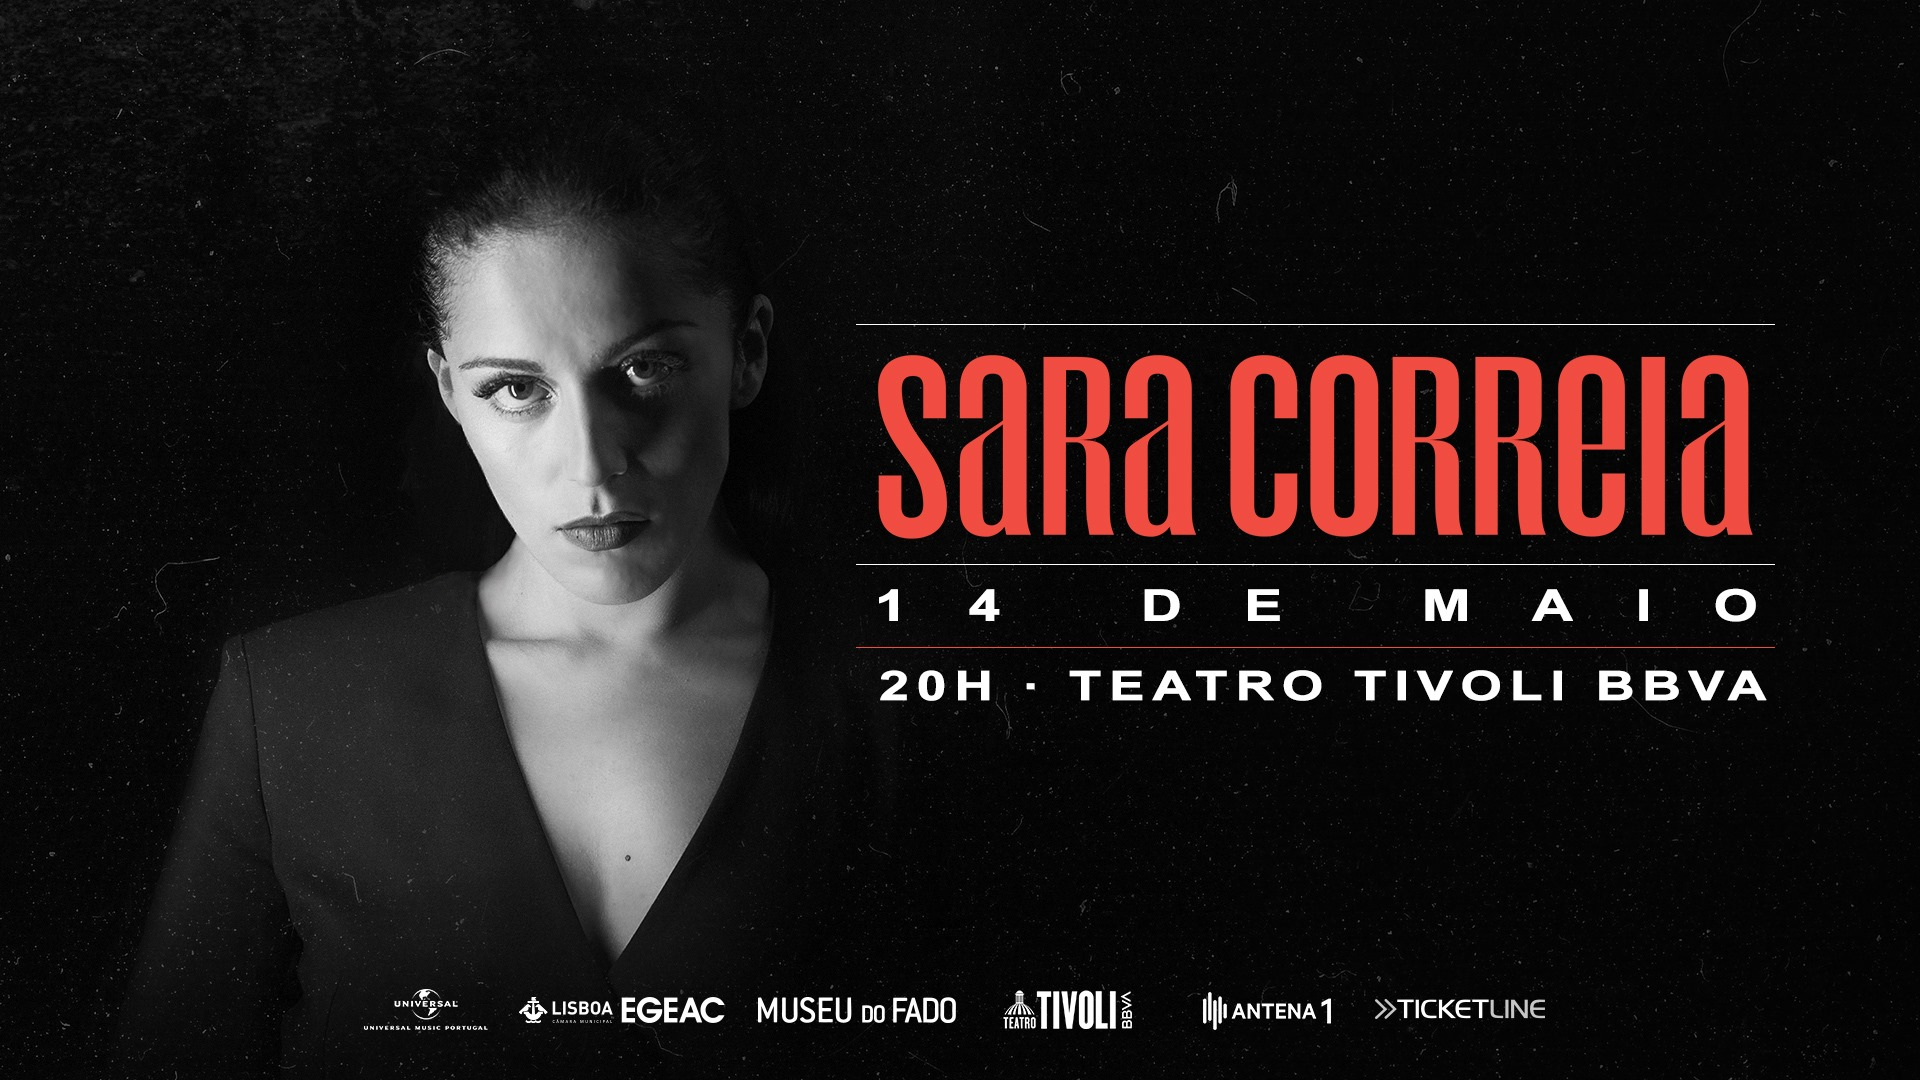 Sara Correia ao vivo no Teatro Tivoli (Lisboa) - 14 Maio